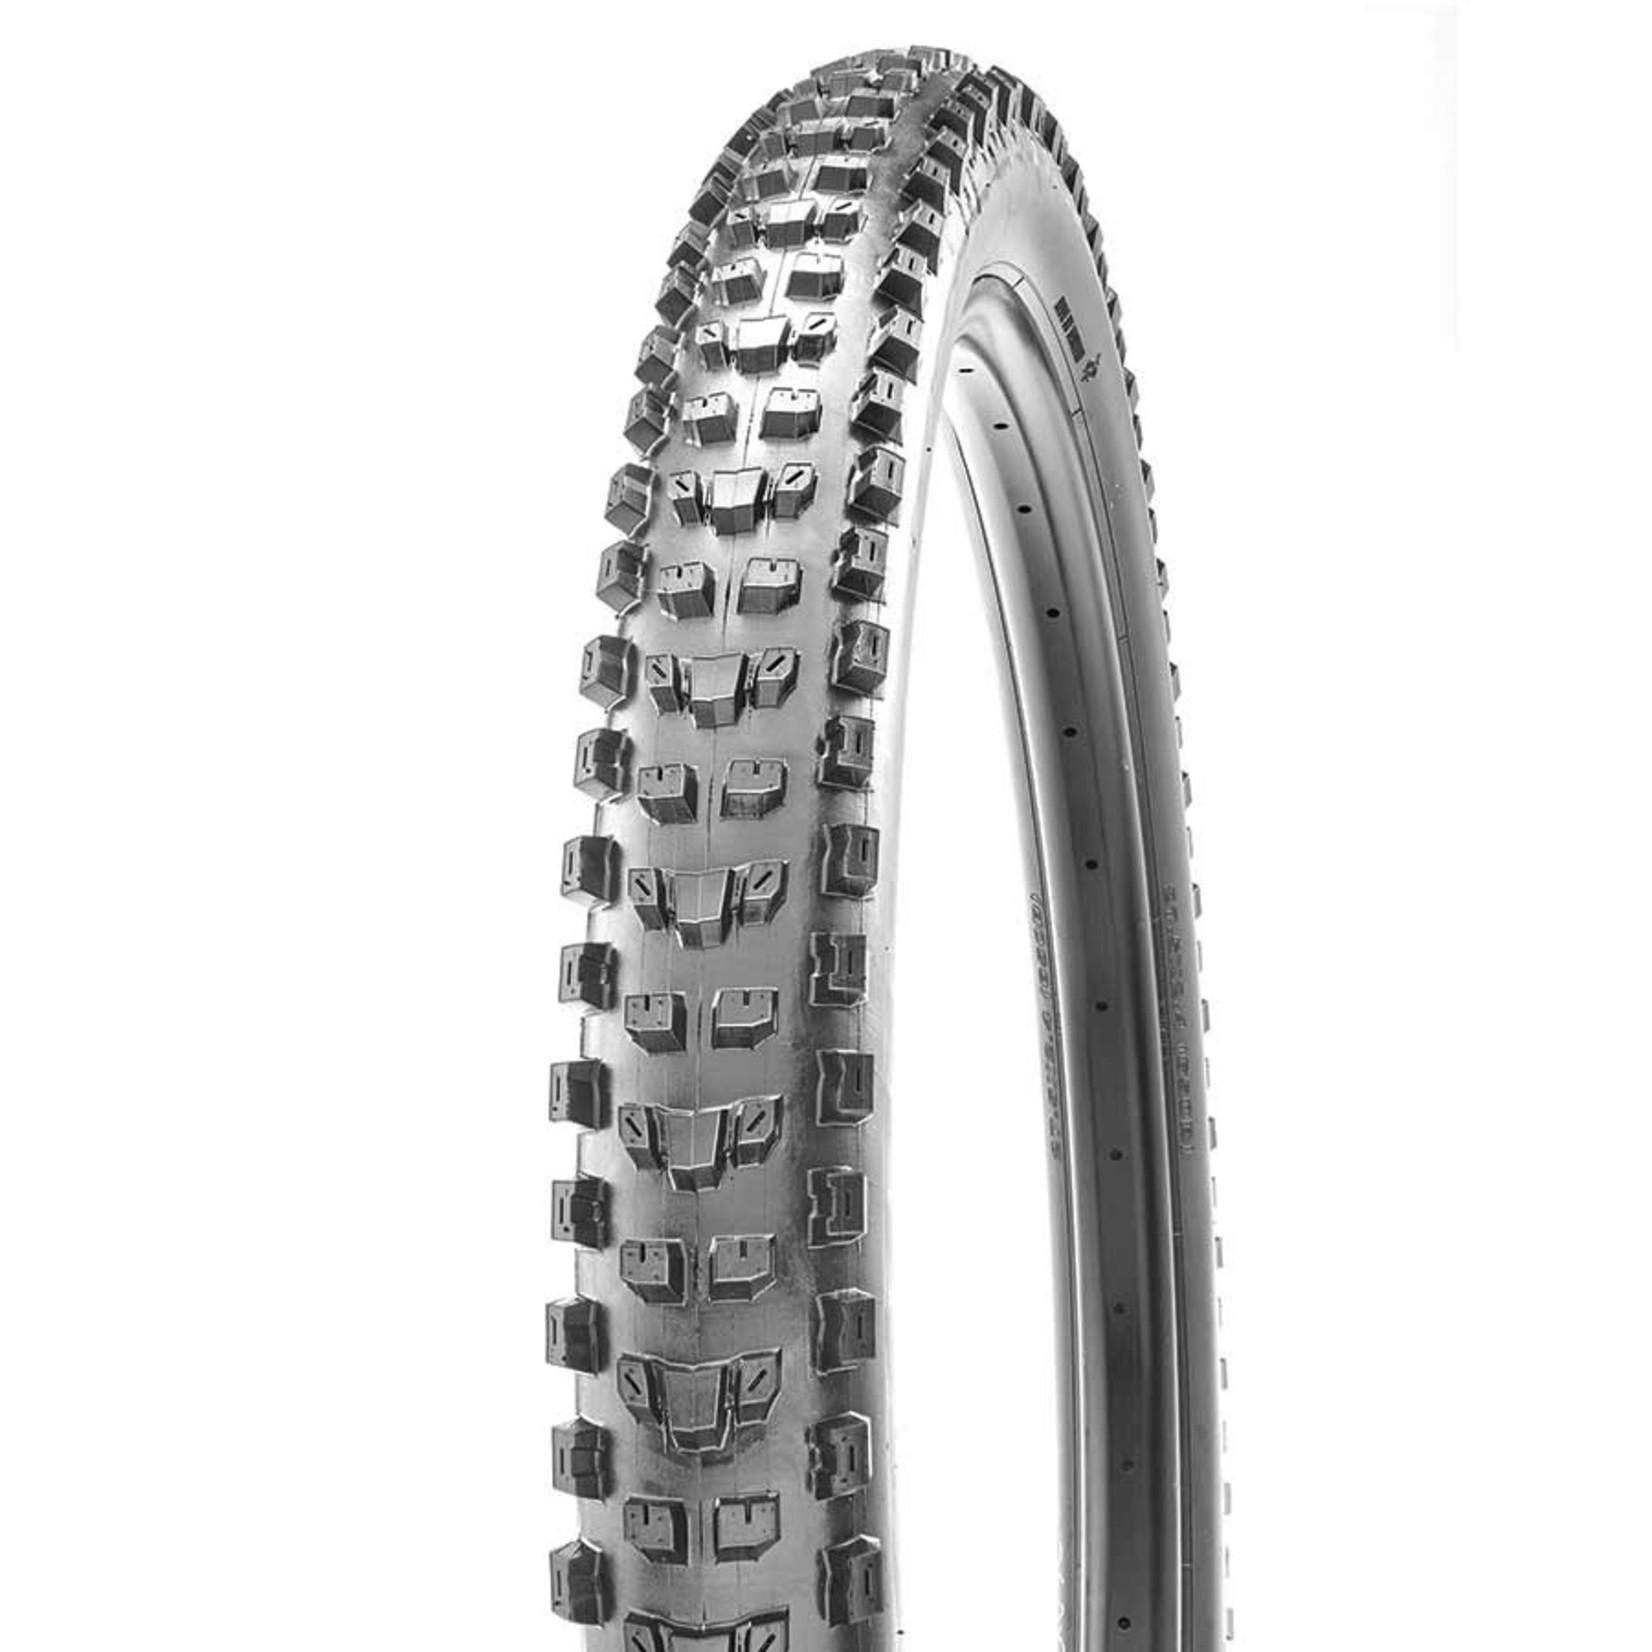 Maxxis Maxxis Dissector EXO 27.5x2.4WT Folding Bead Tubeless Ready Tire